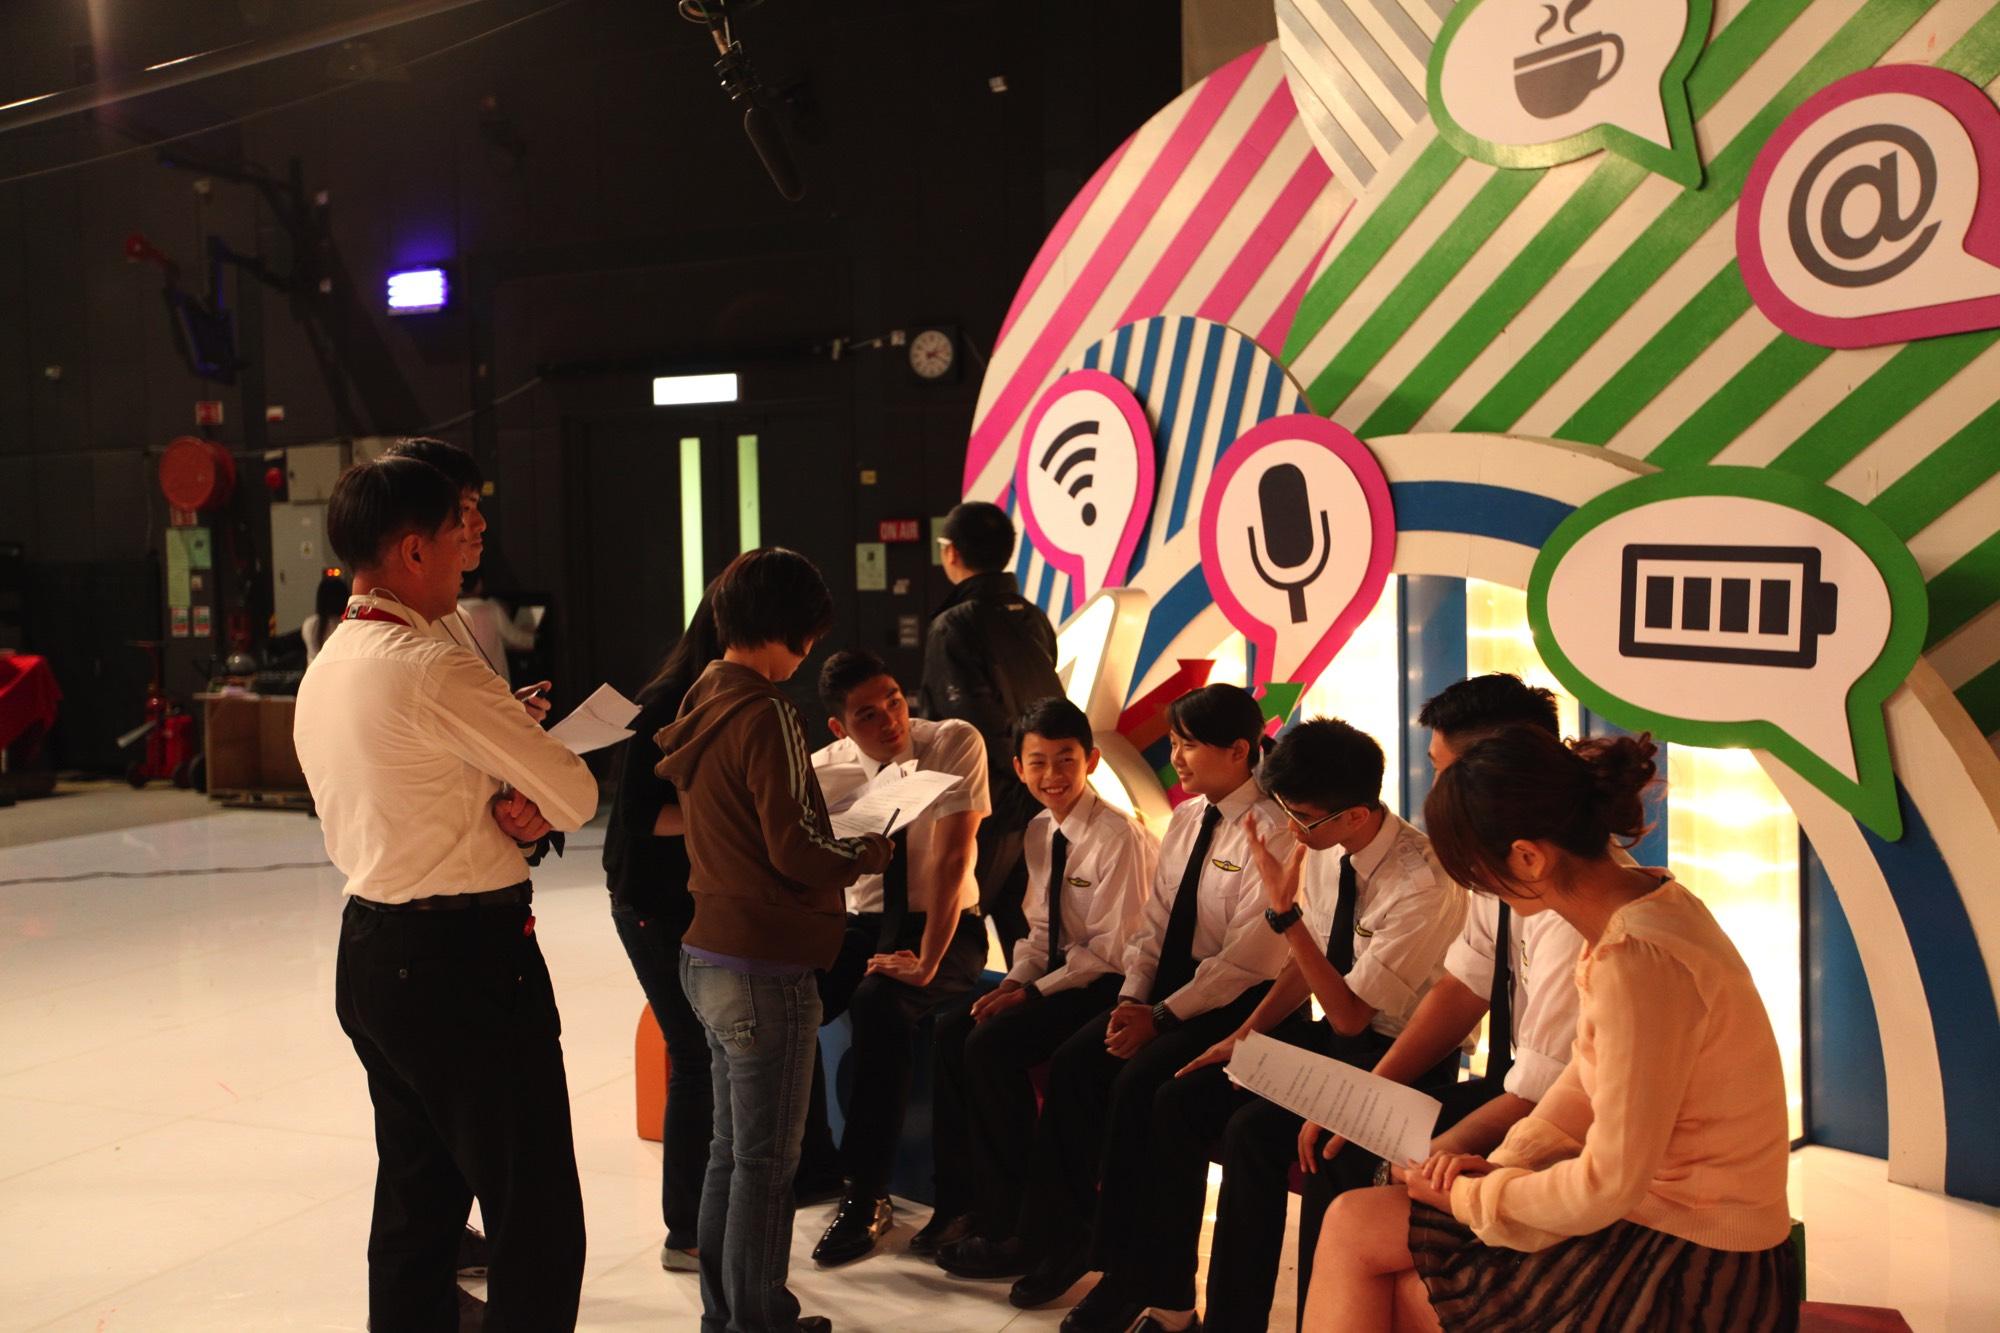 2013-Nzfta-TVB-42